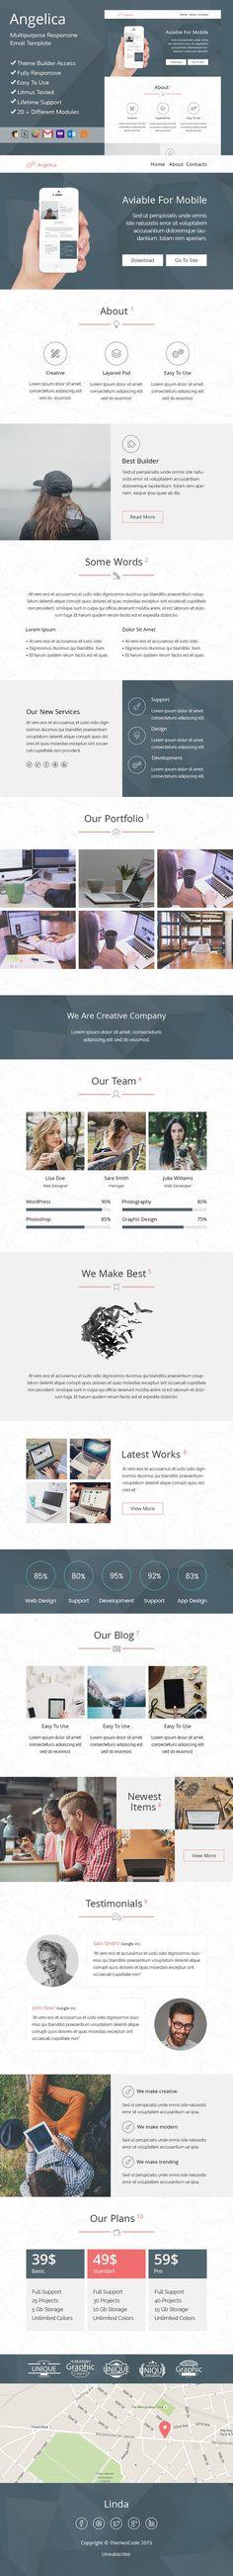 Angelica-responsive email+SR builder